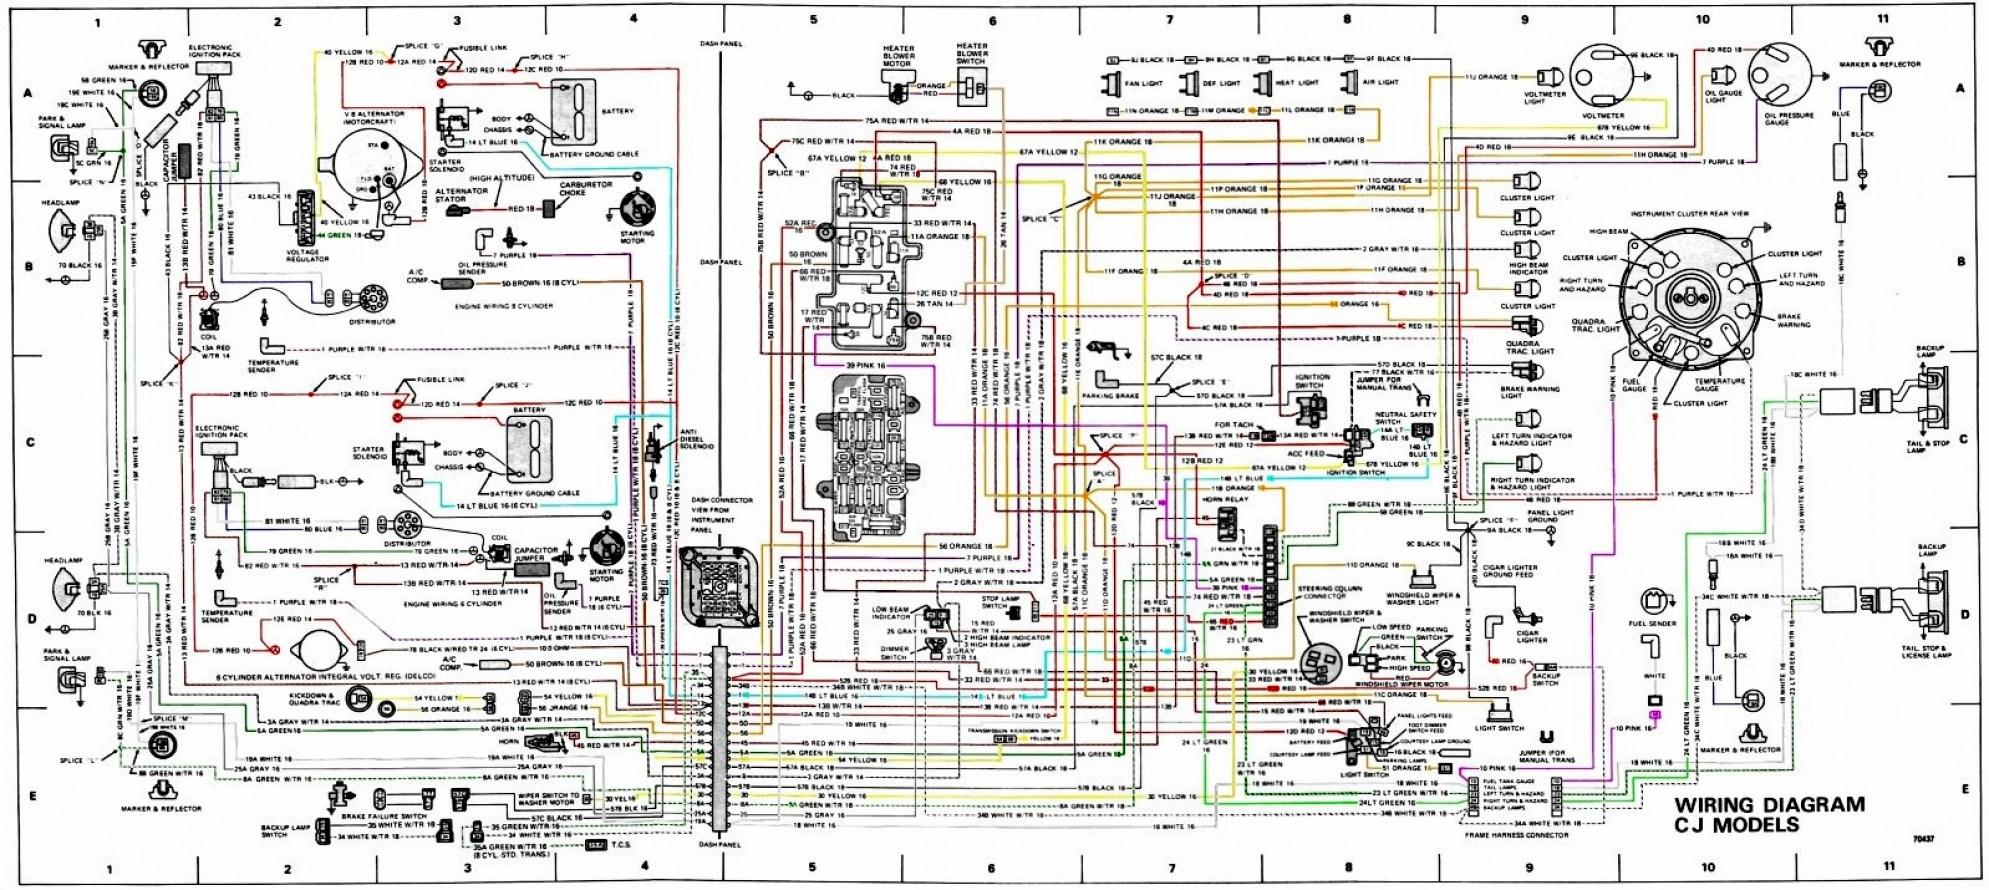 1979 jeep cj7 wiring schematic - wiring diagram data 1979 jeep cj5 fuse box  tennisabtlg-tus-erfenbach.de